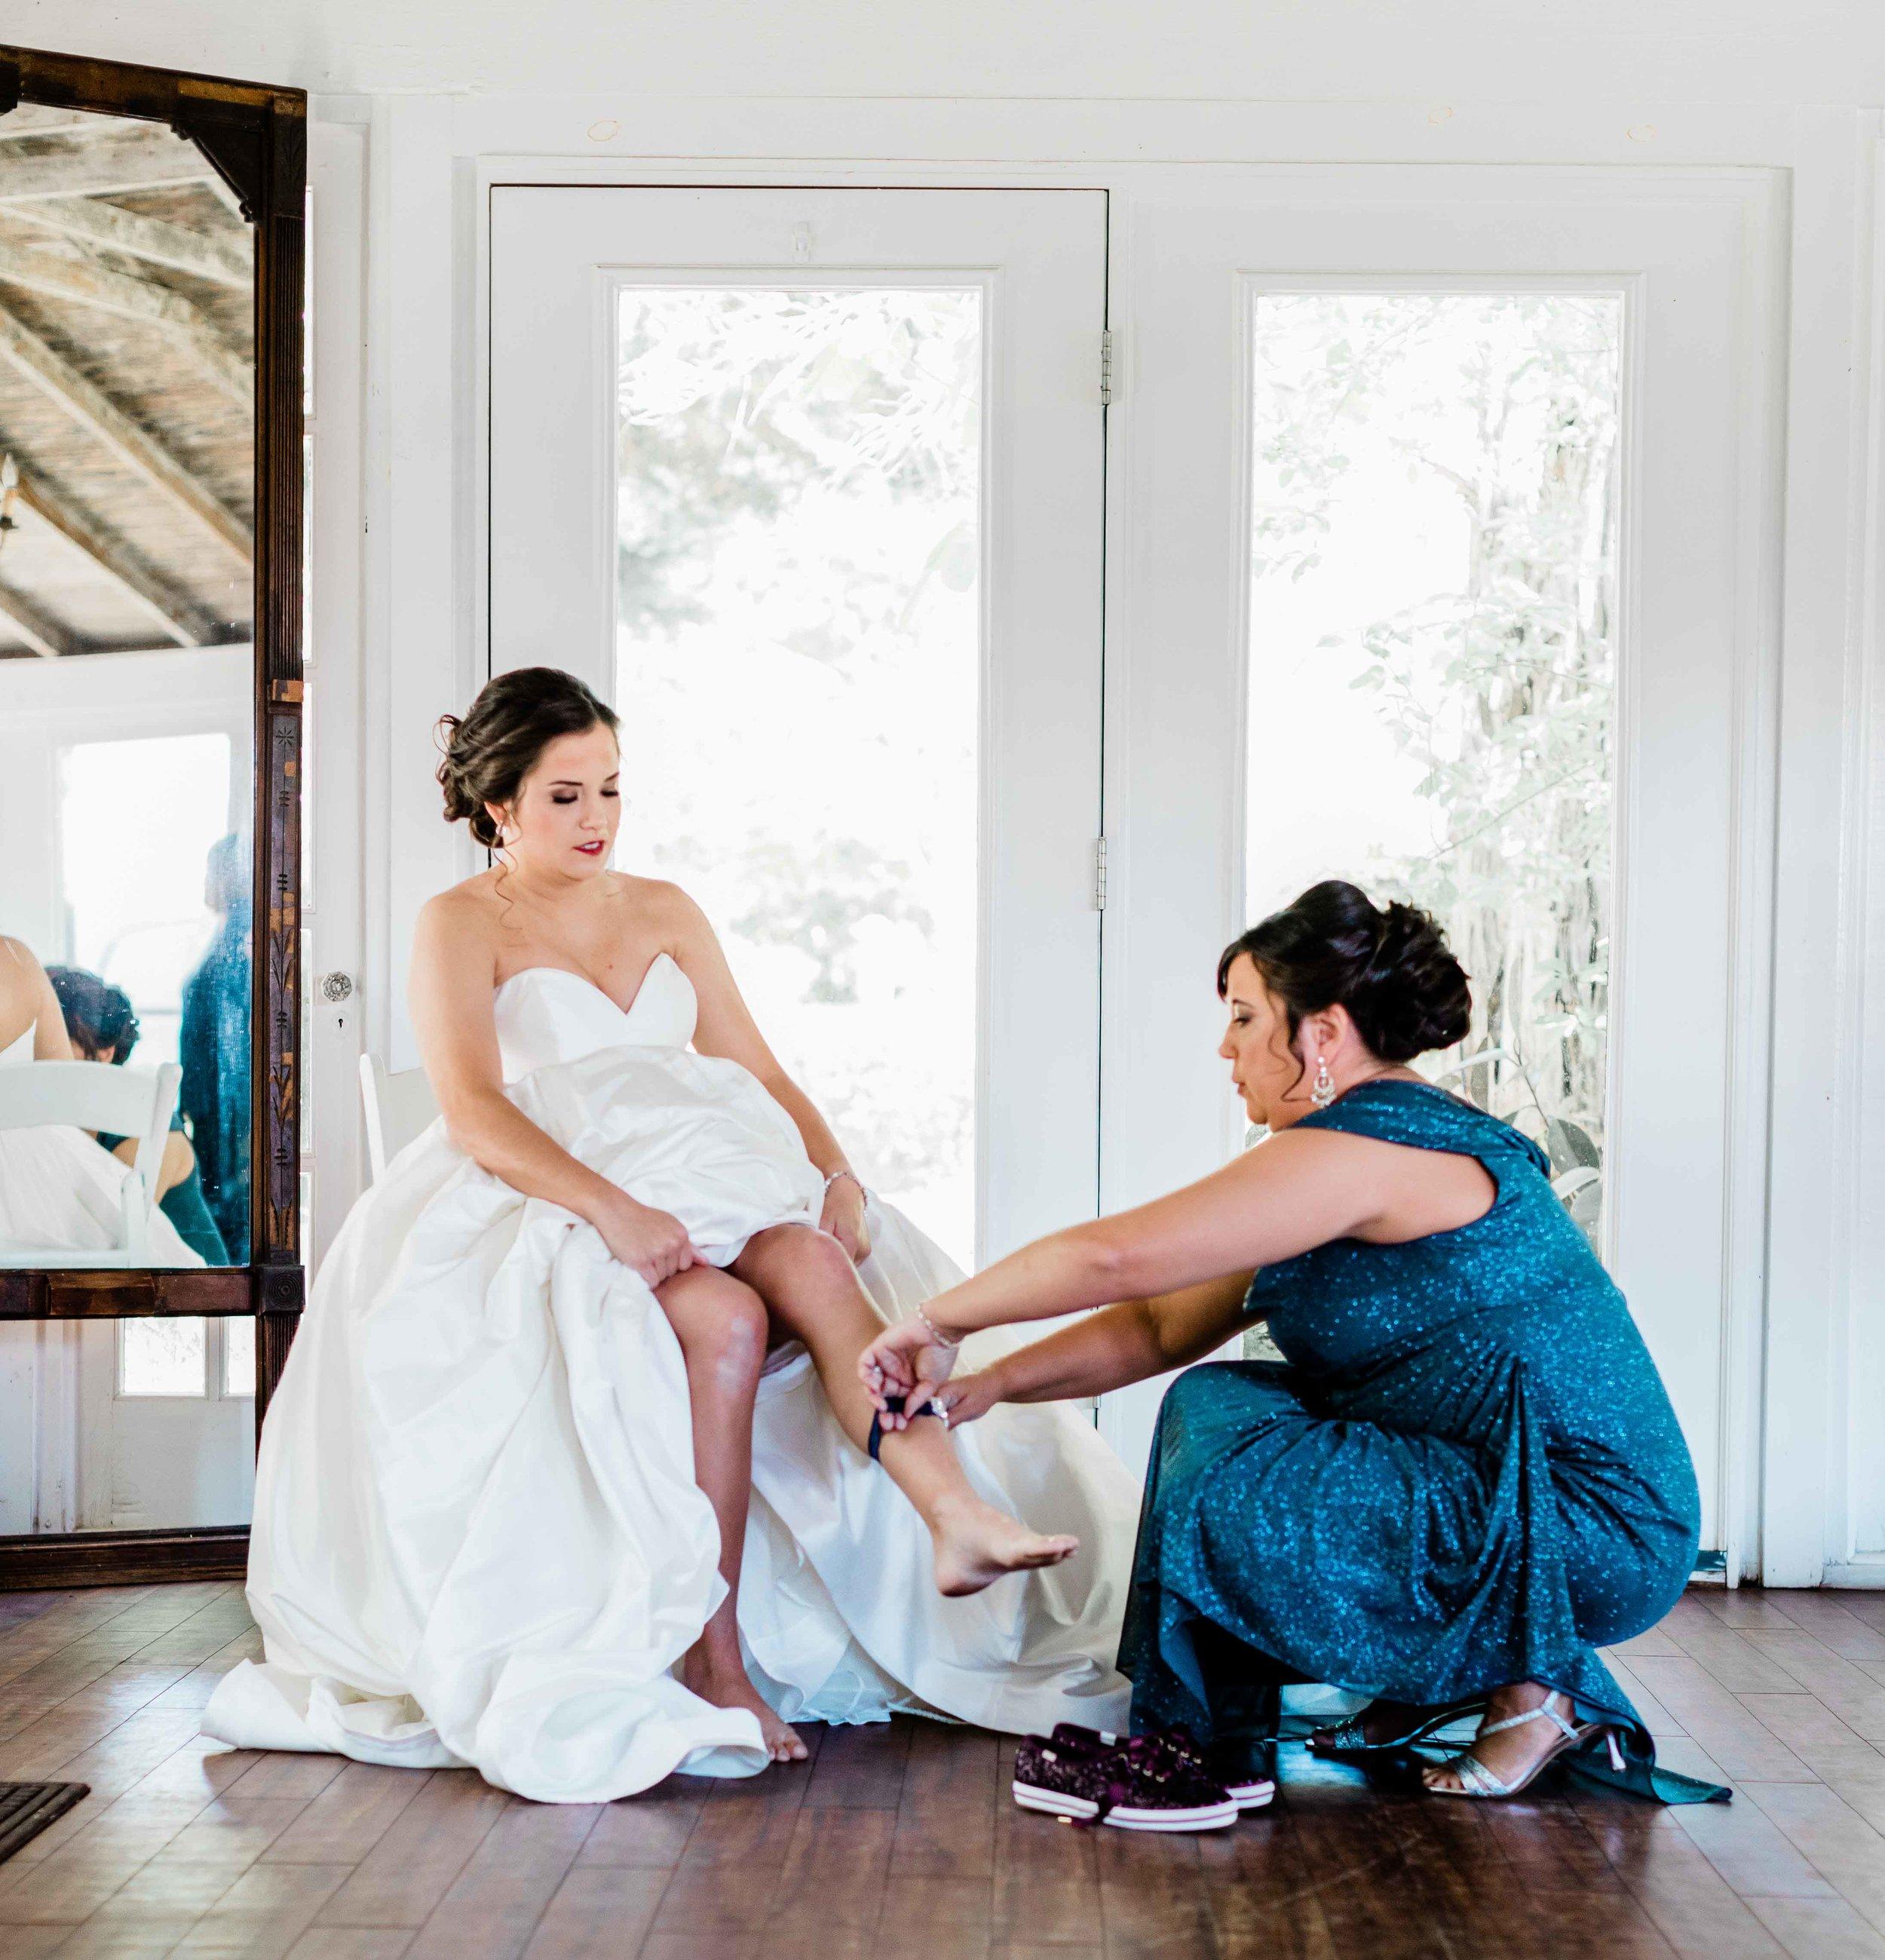 20190427-Southern Lens Photography- Savannah Wedding Photographer-Screven and Caroline-201922.jpg